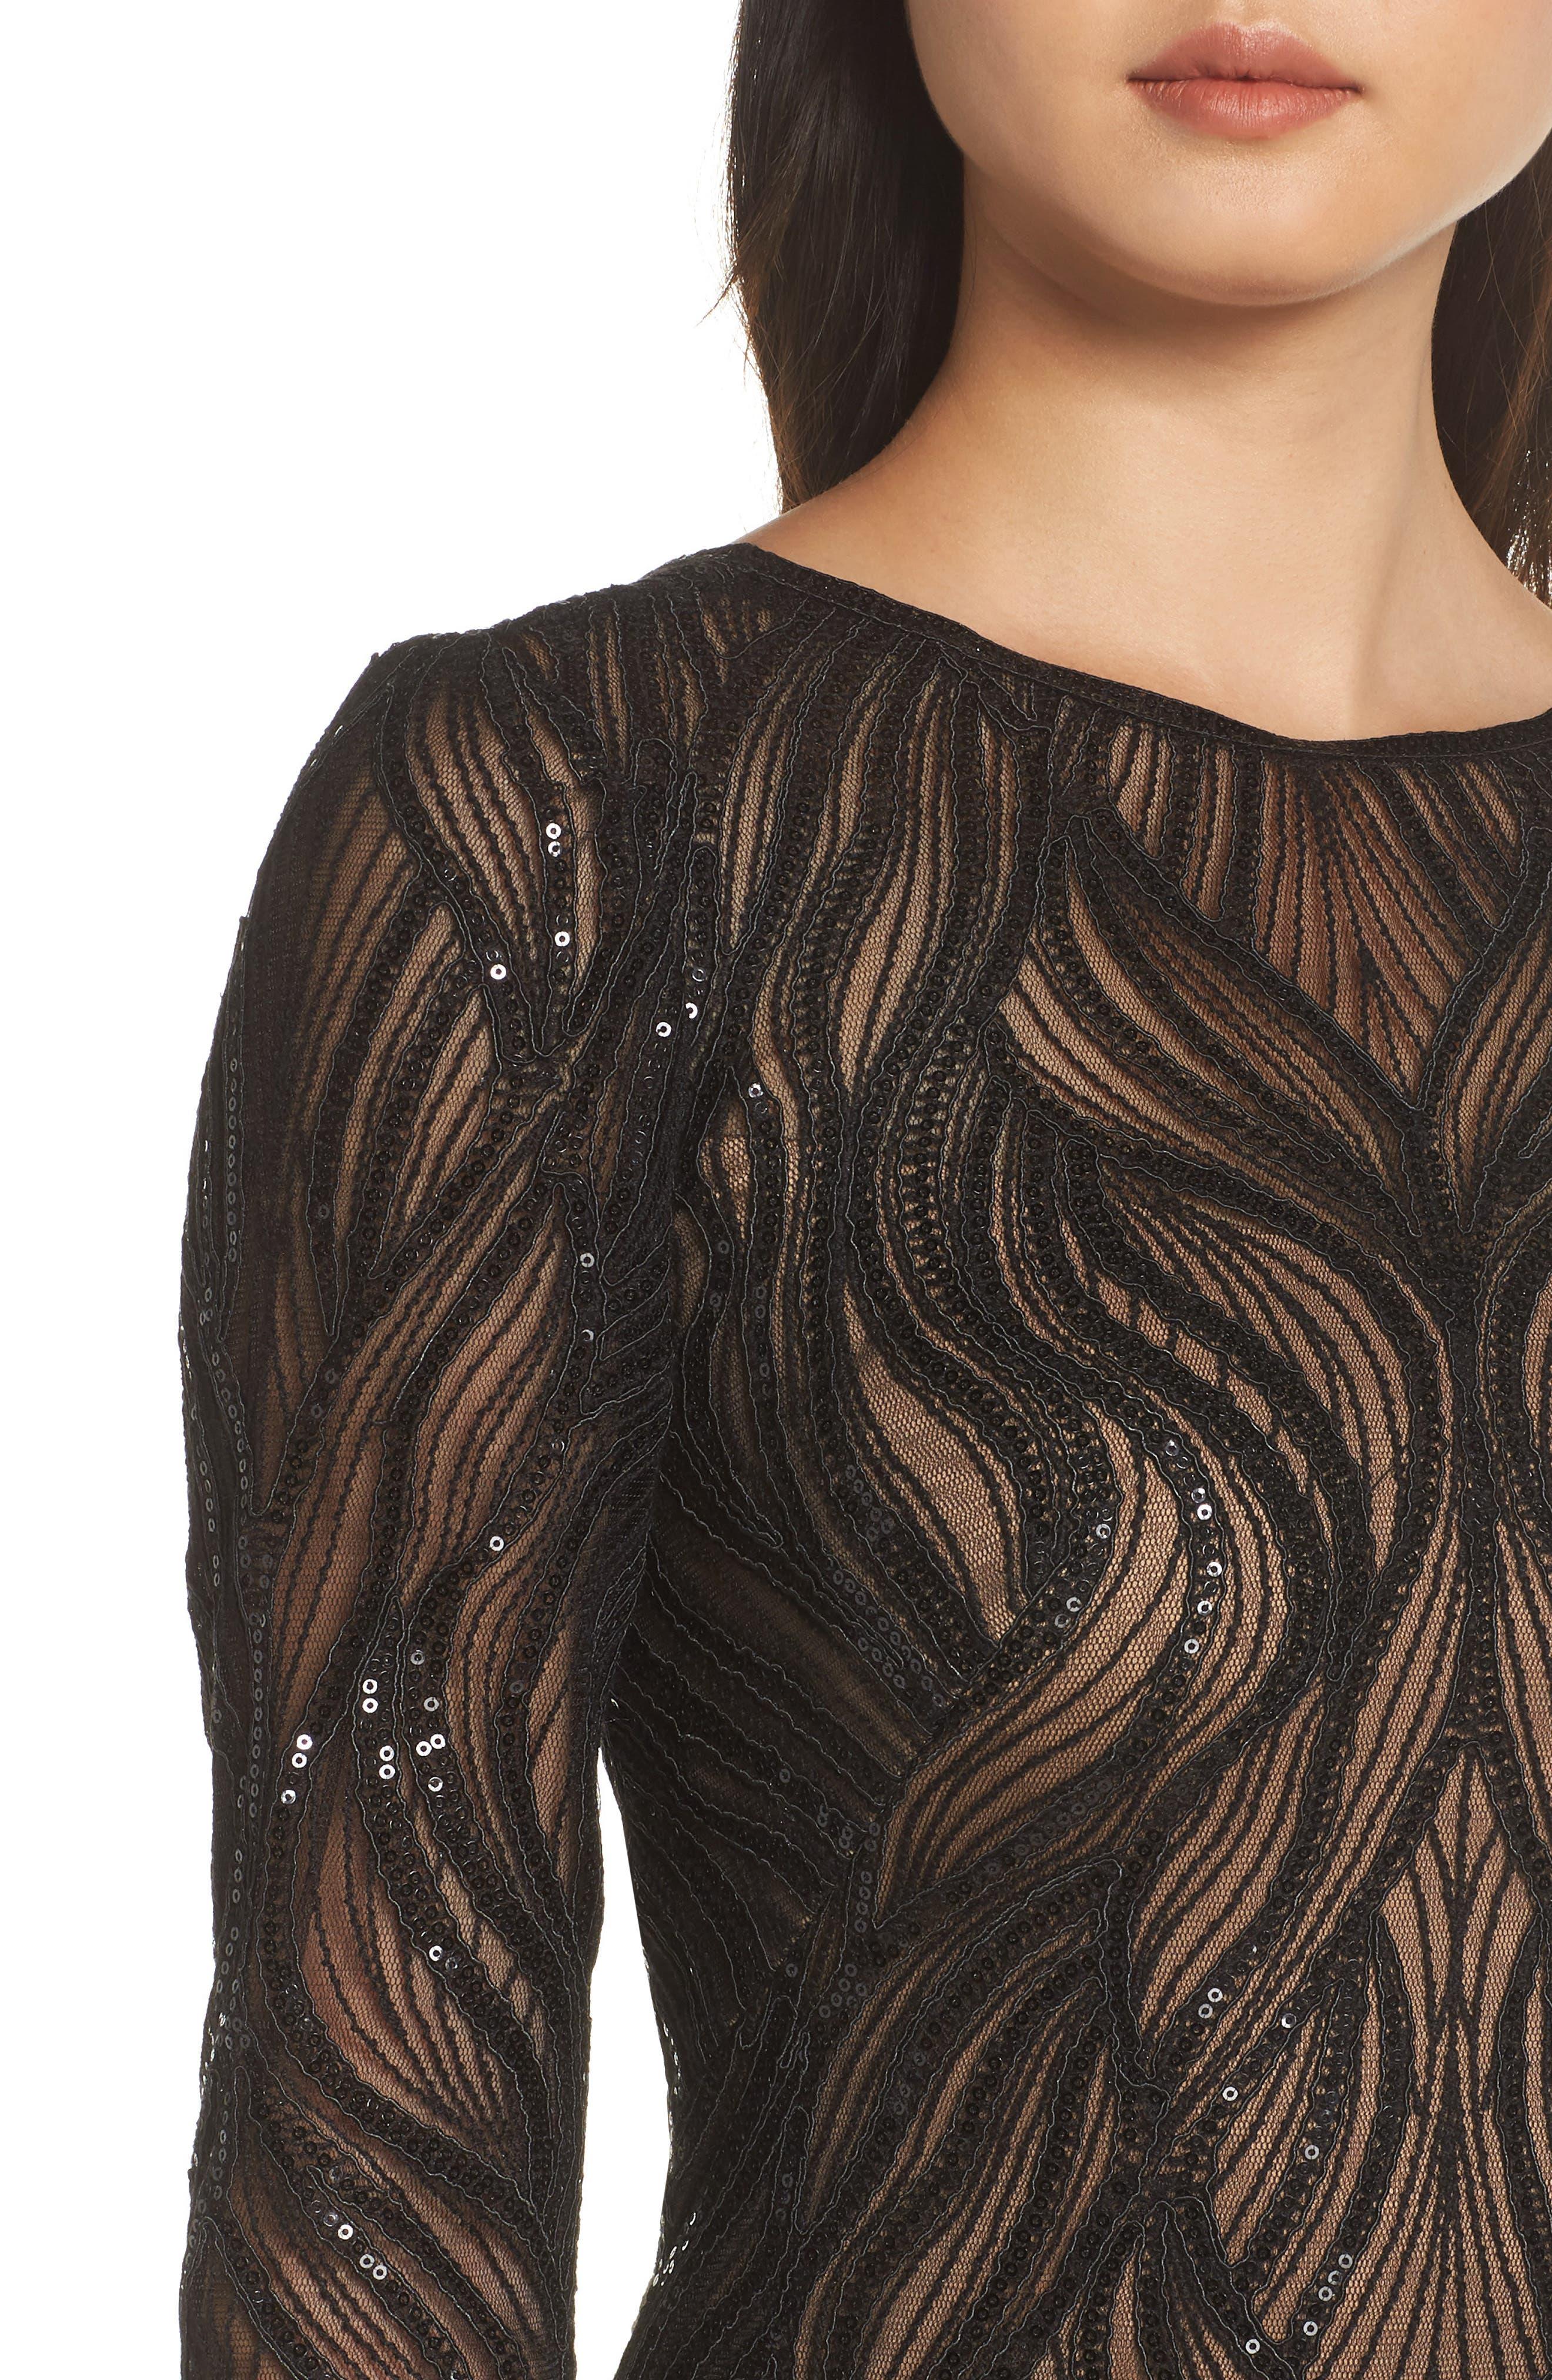 TADASHI SHOJI, Long Sleeve Sequined Mesh Evening Dress, Alternate thumbnail 5, color, 001